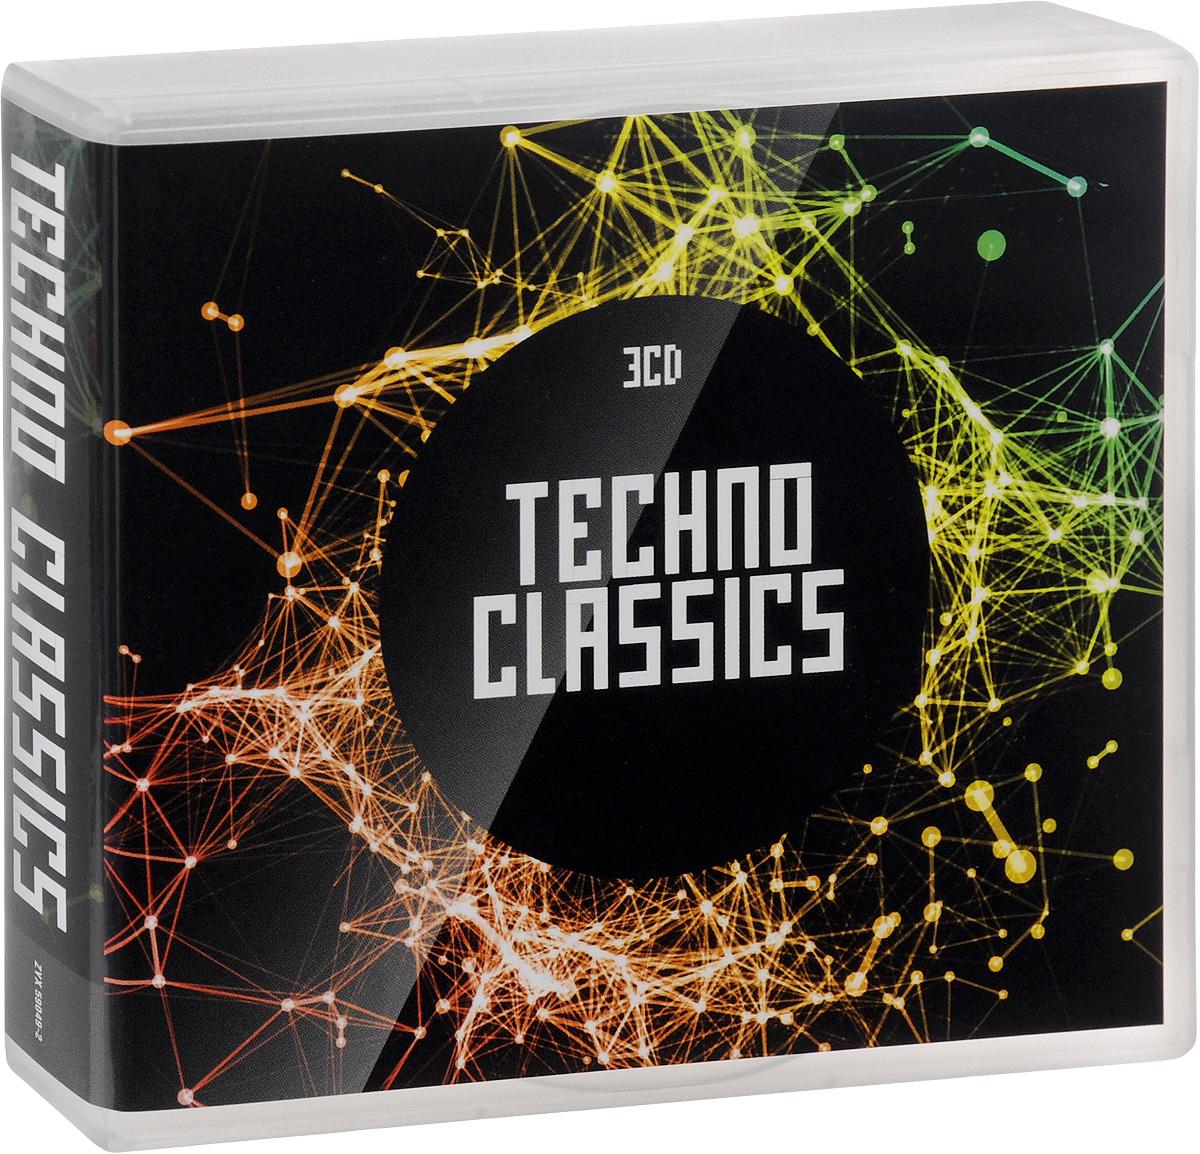 Misar,The Hose,Майк Коглинс,Nalin & Kane,G Punkt,`Coolcut`,Beatrice,The Ventures,Iridium-Gold,Three Drives On A Vinyl Techno Classics (3 CD) techno classics